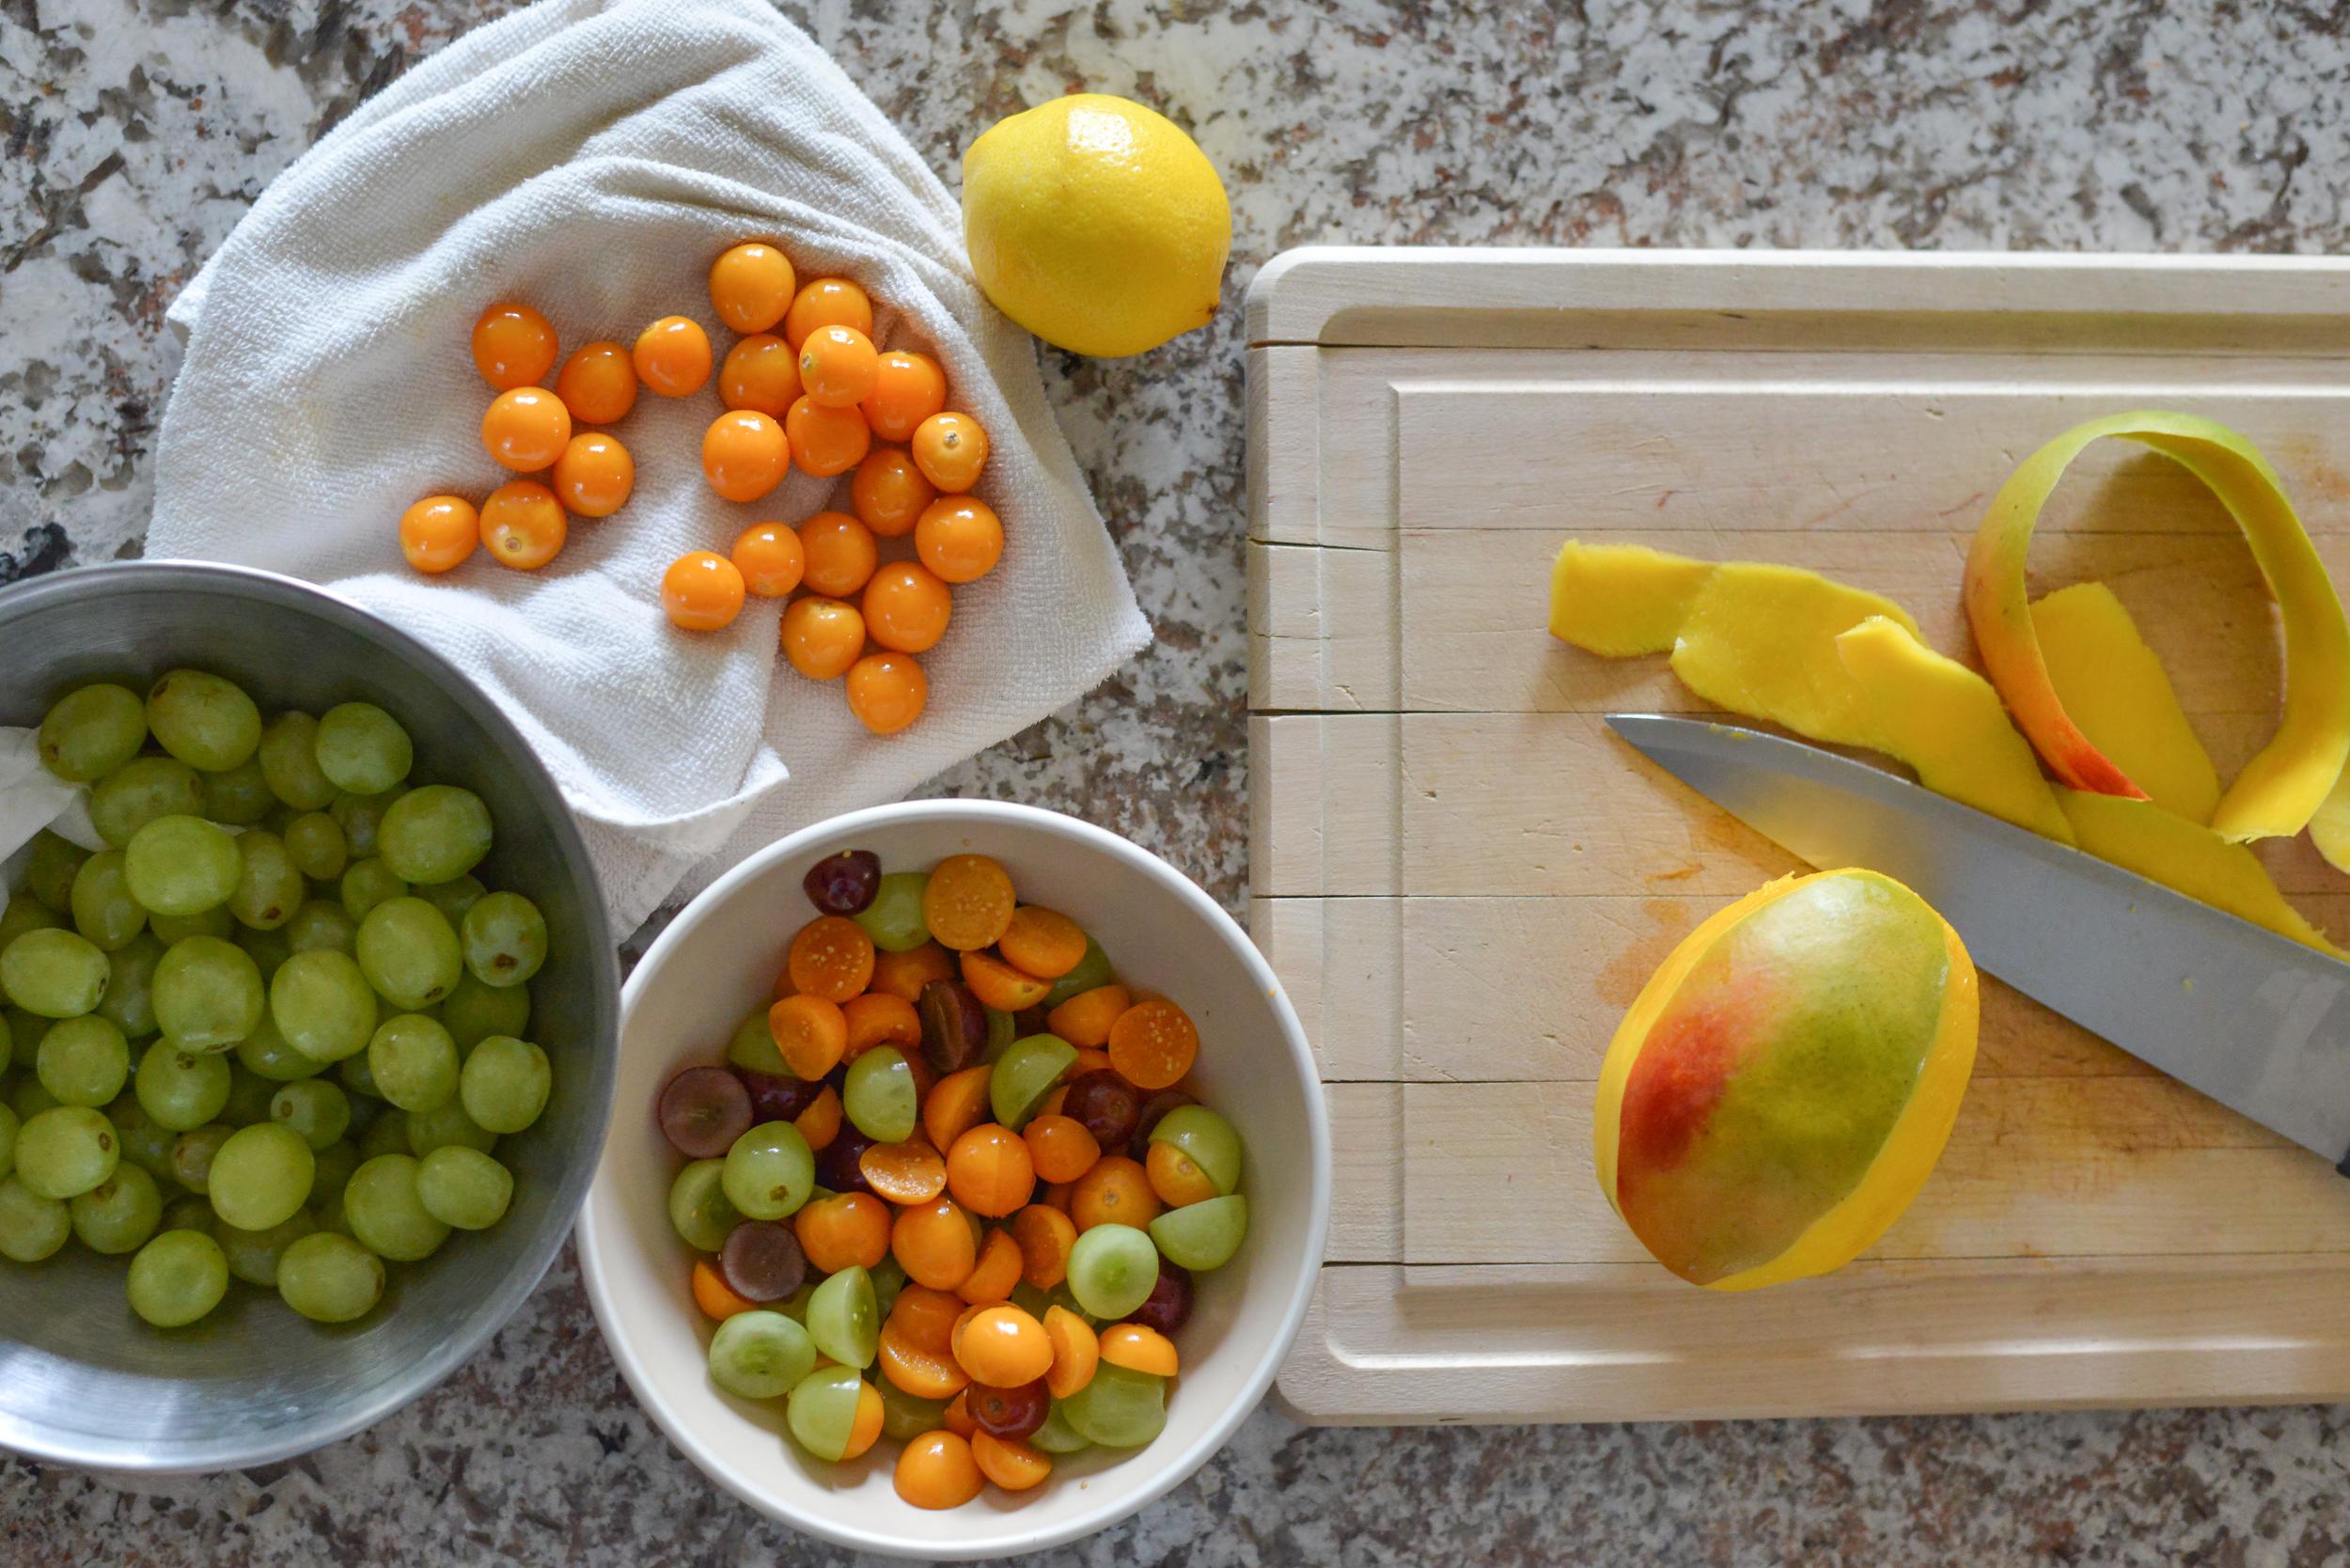 Pichu salad ingredients